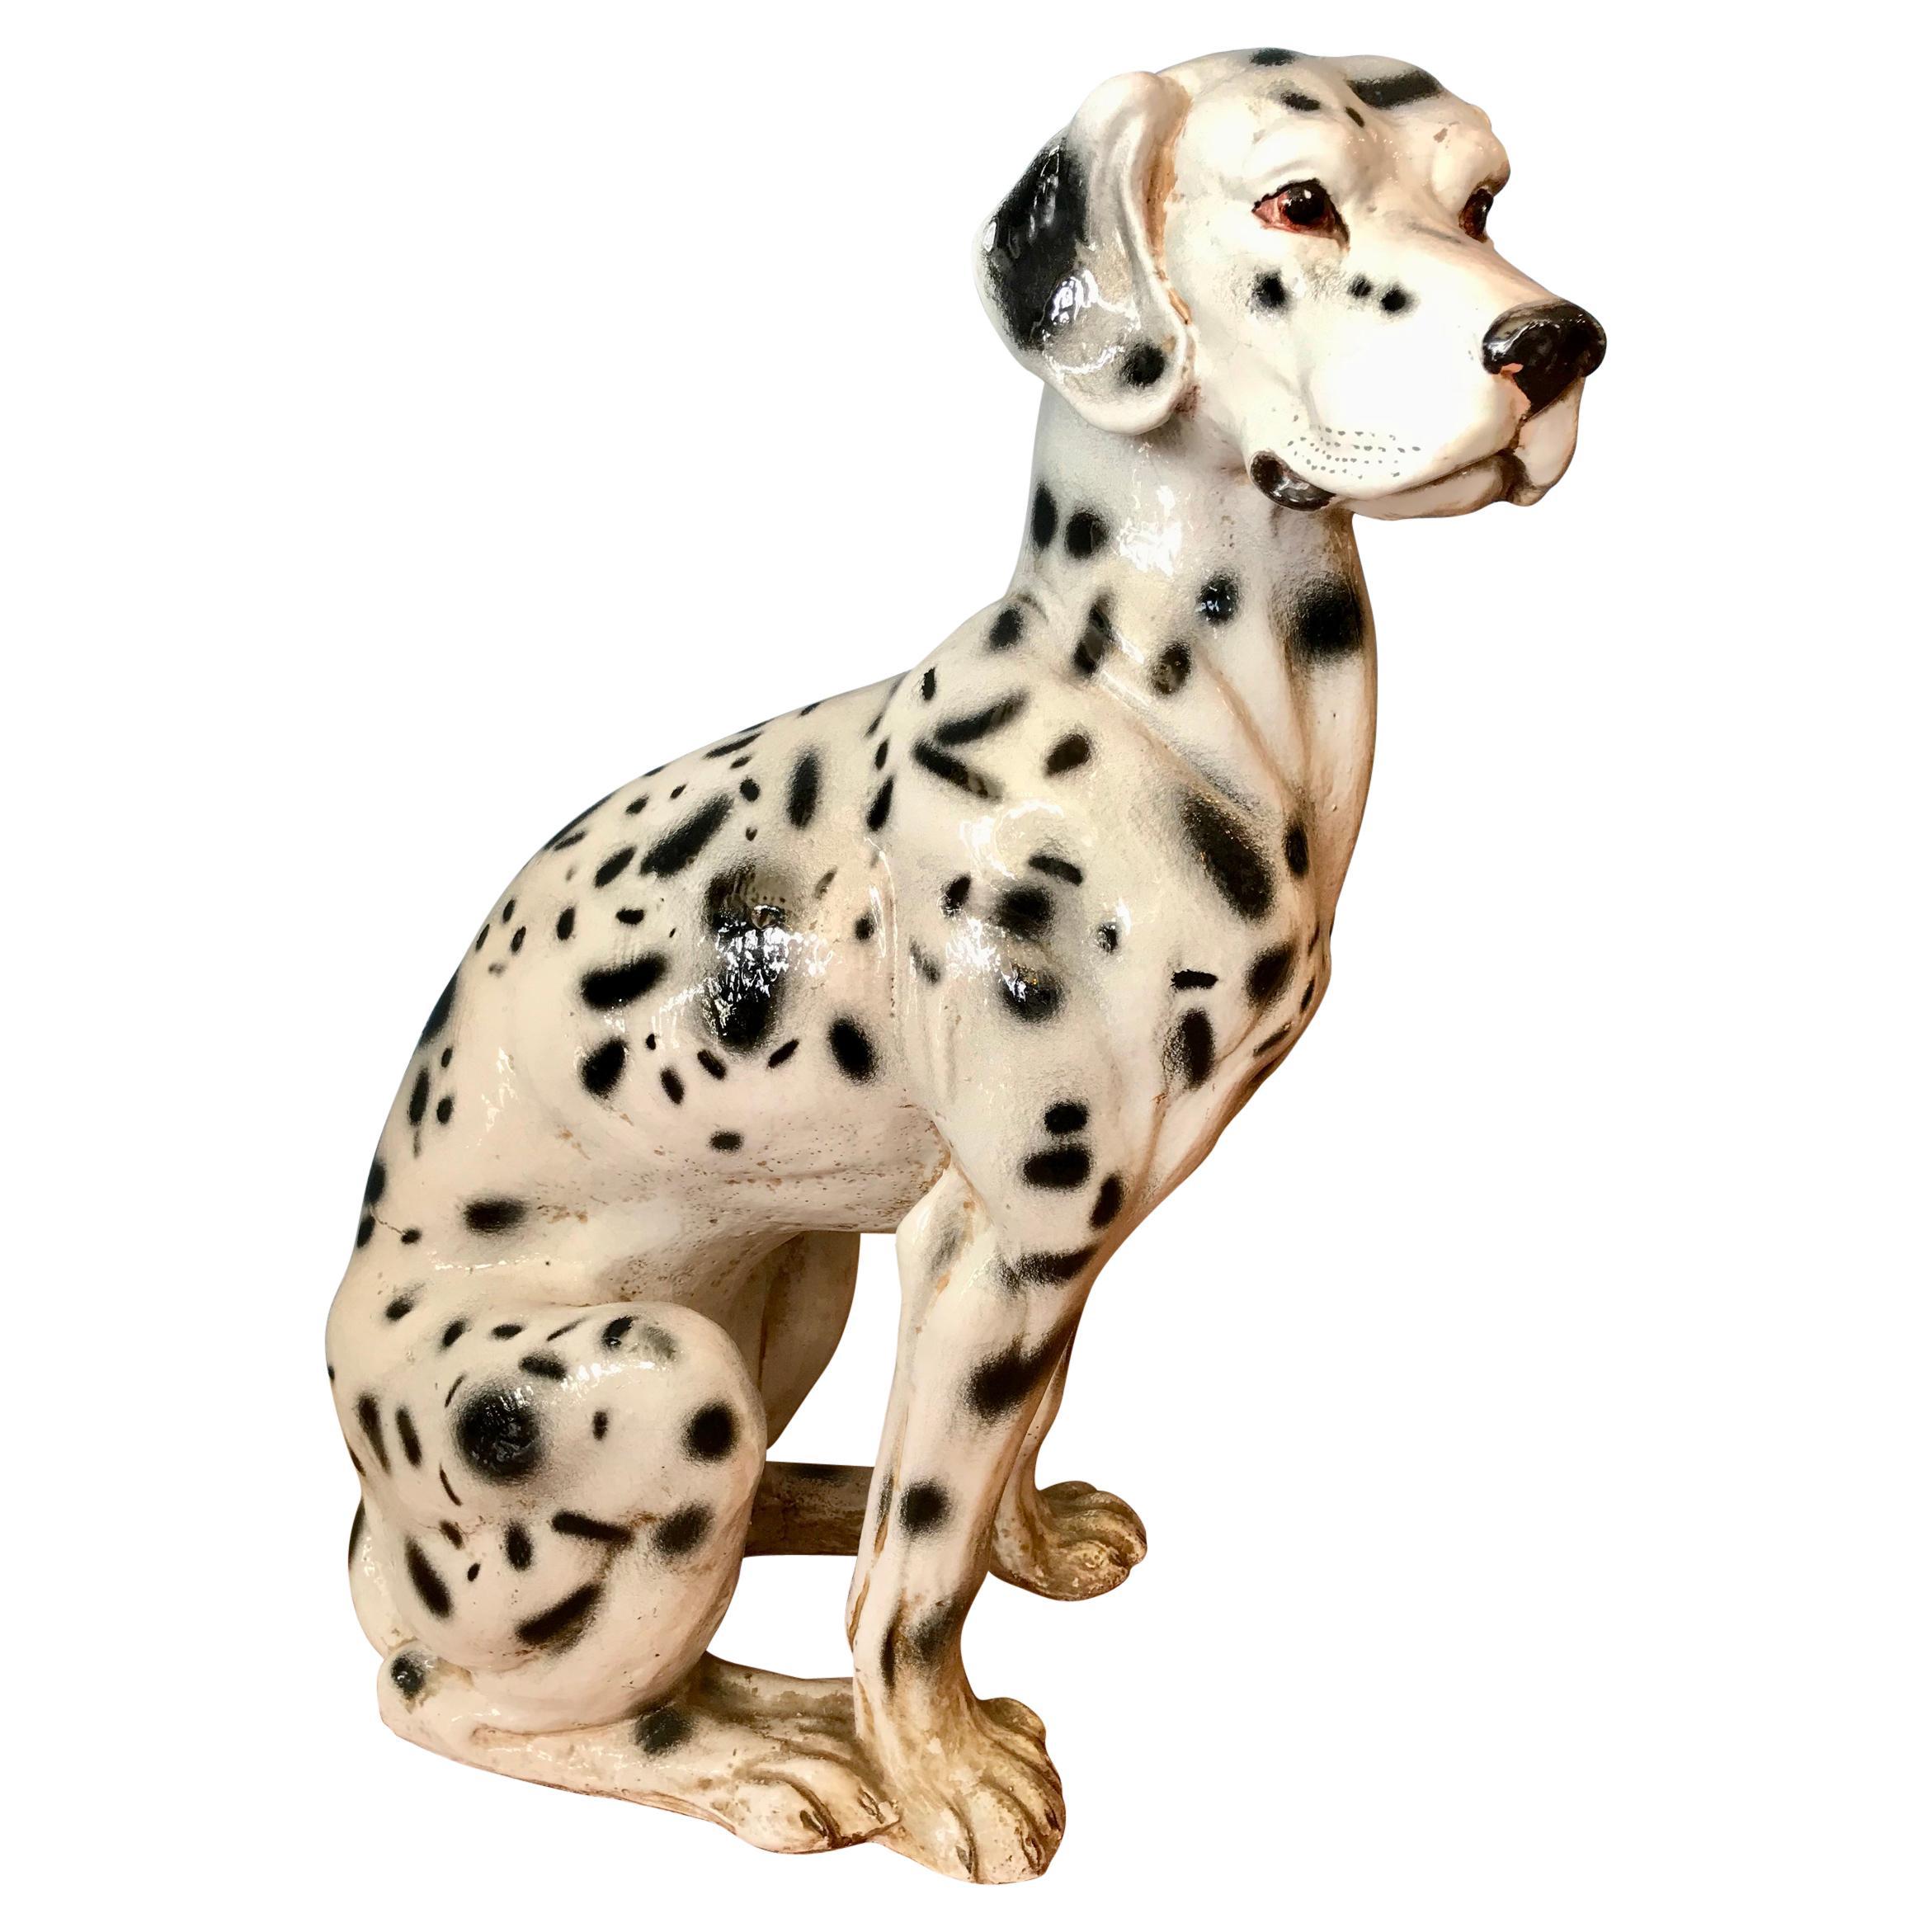 Life Size Terra Cotta Figure of a Dalmatian